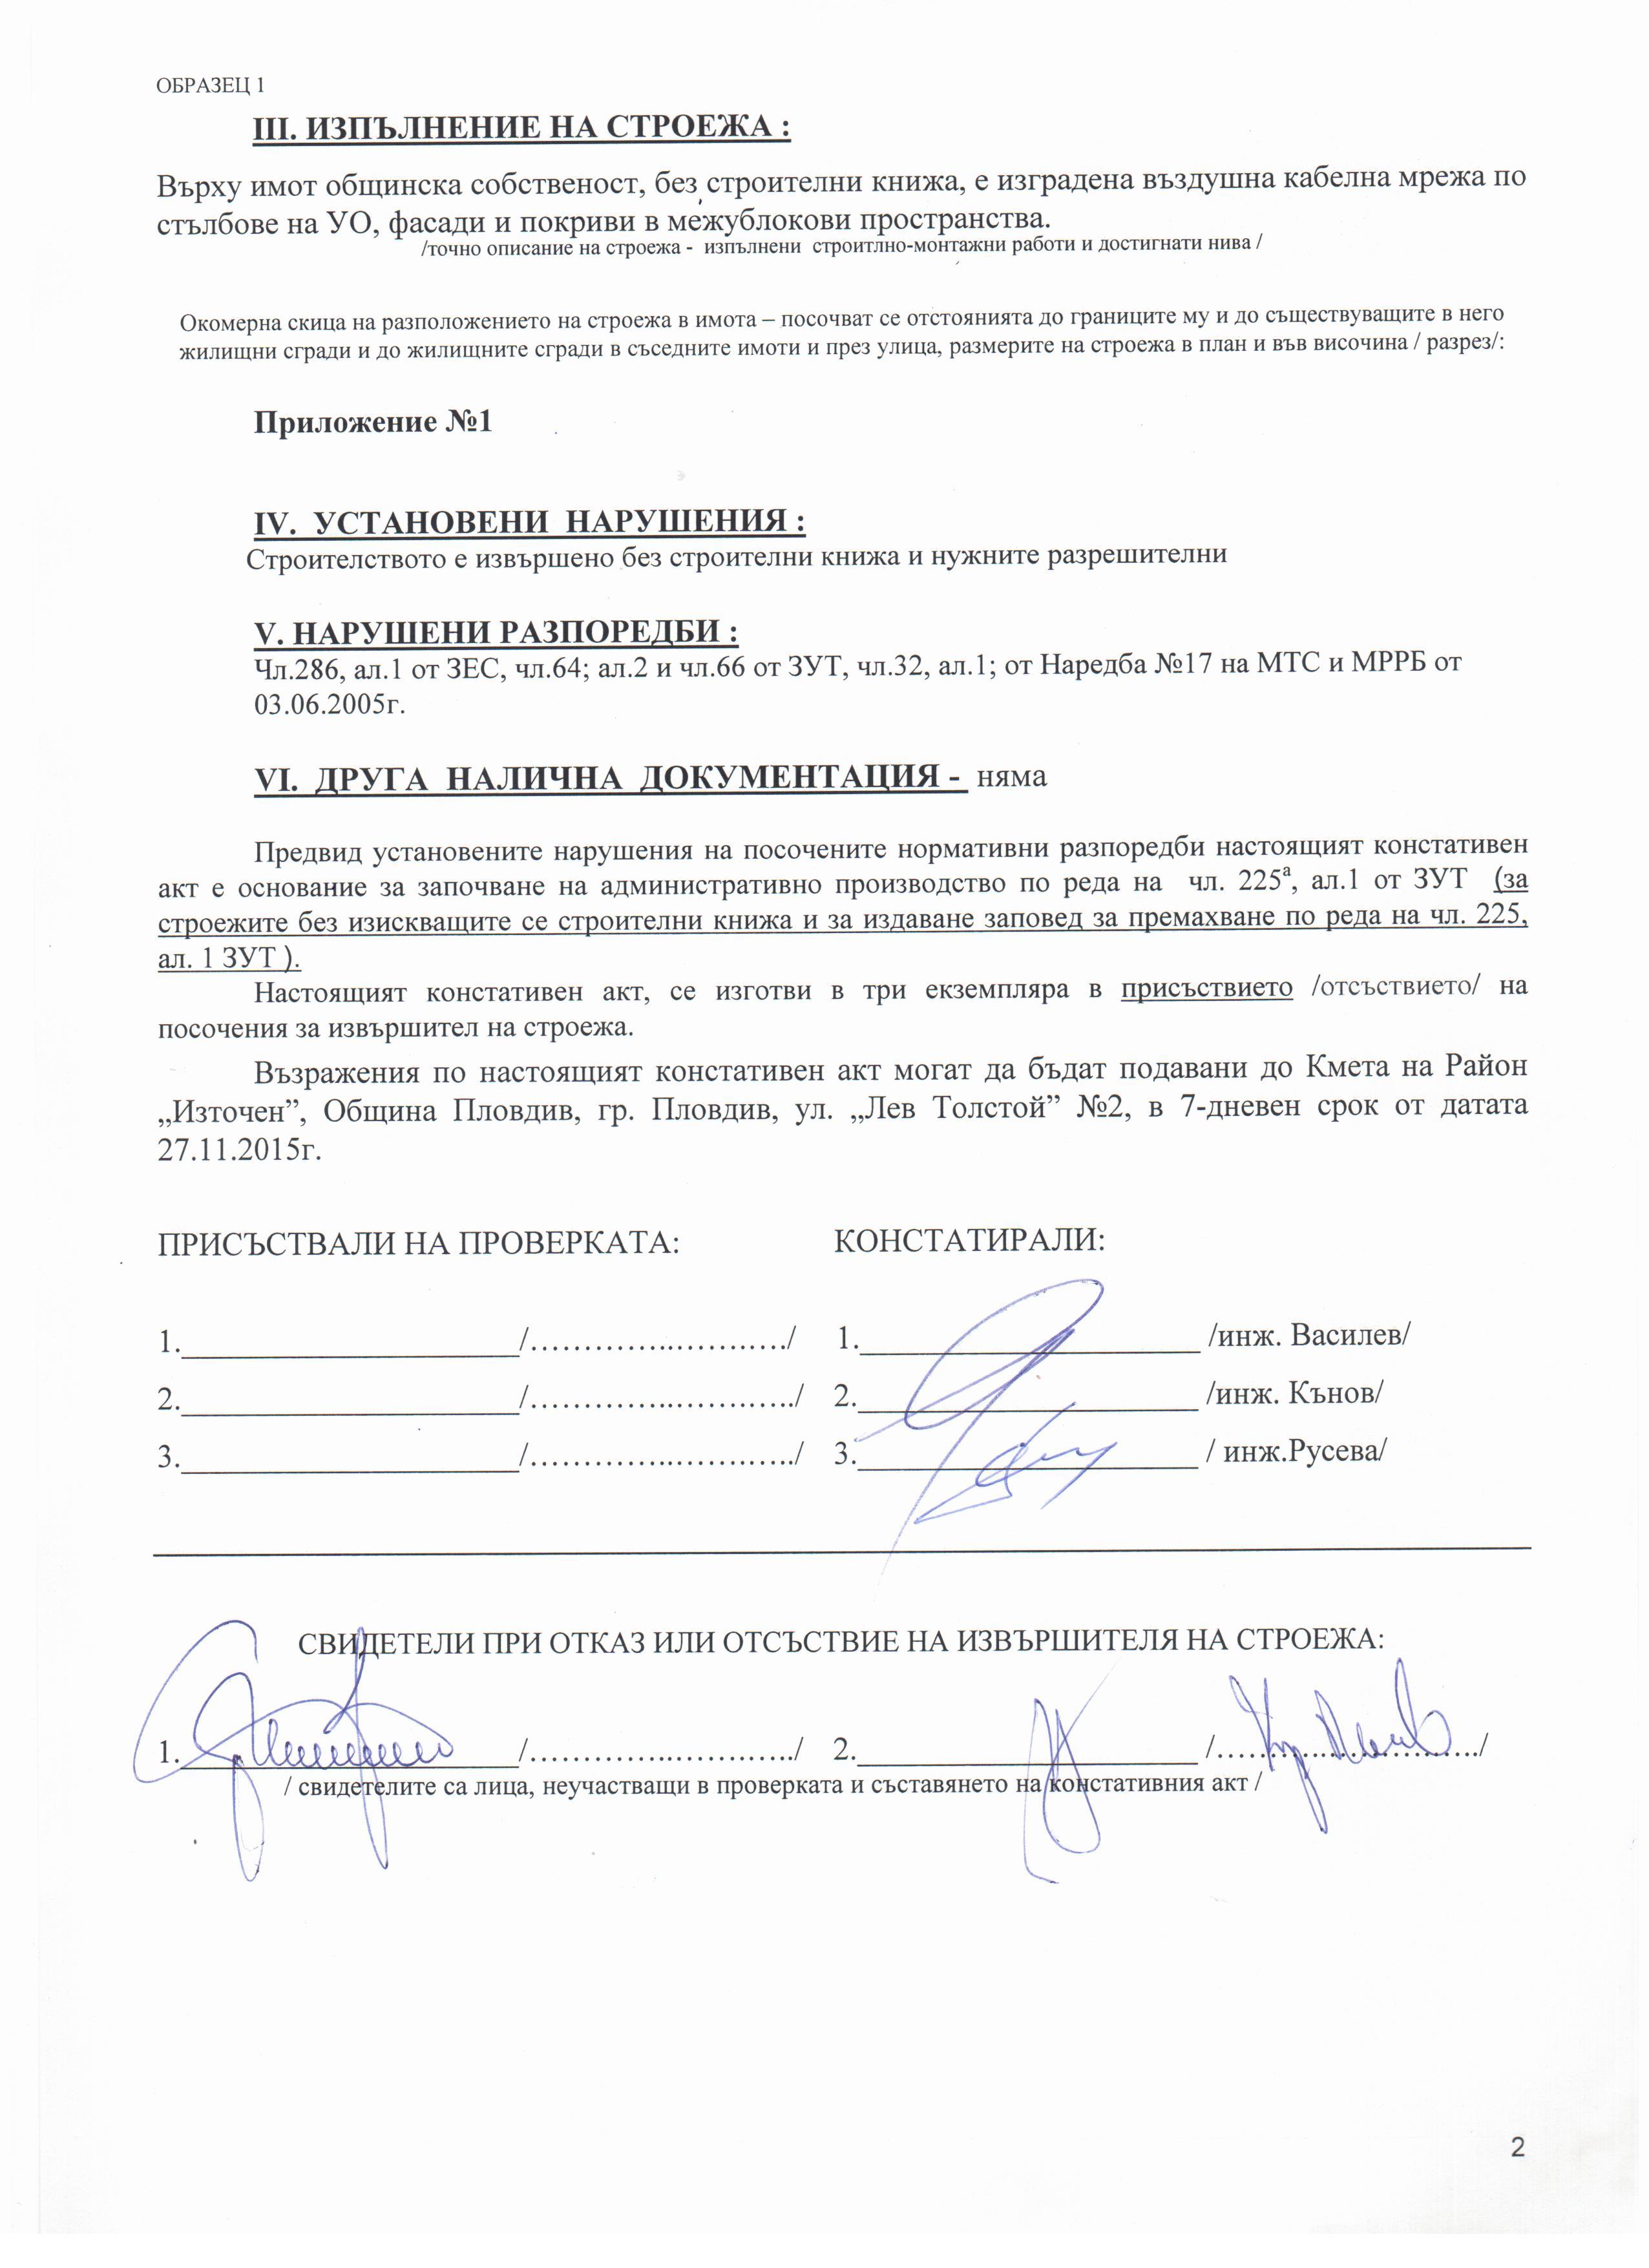 KONSTATIVEN_AKT_№1401